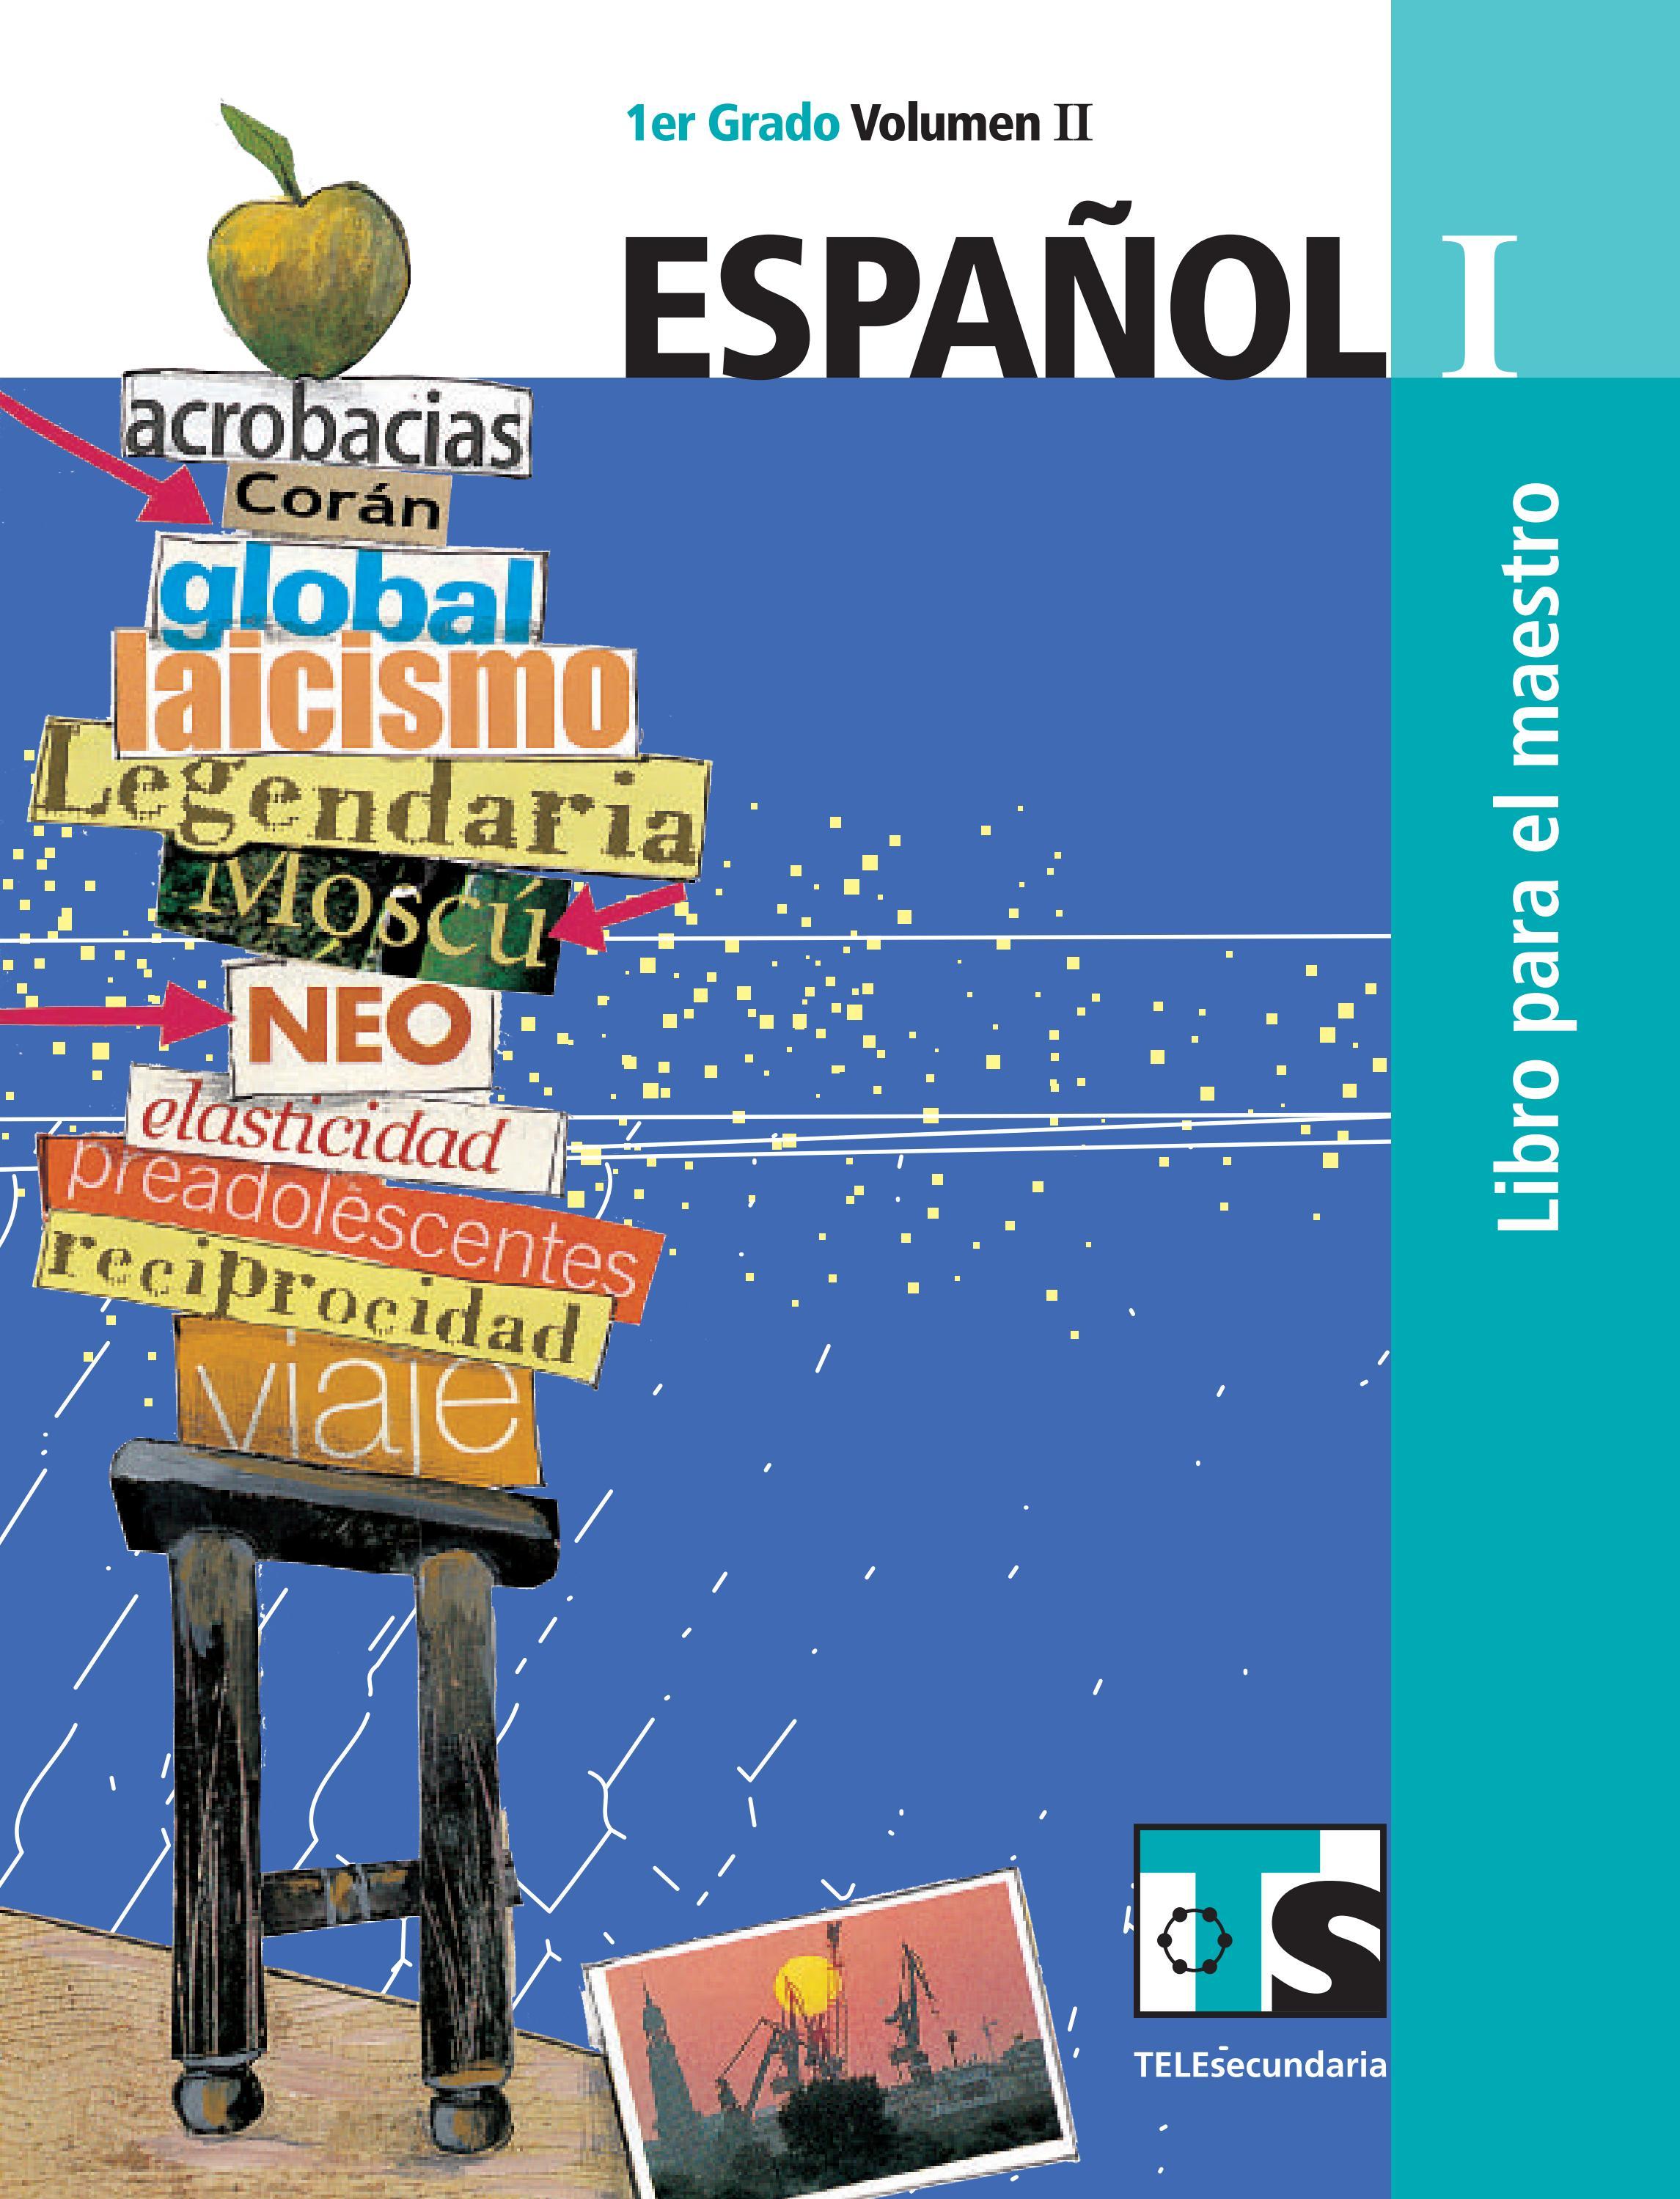 Maestro. Español 1er. Grado Volumen II by Rarámuri - issuu